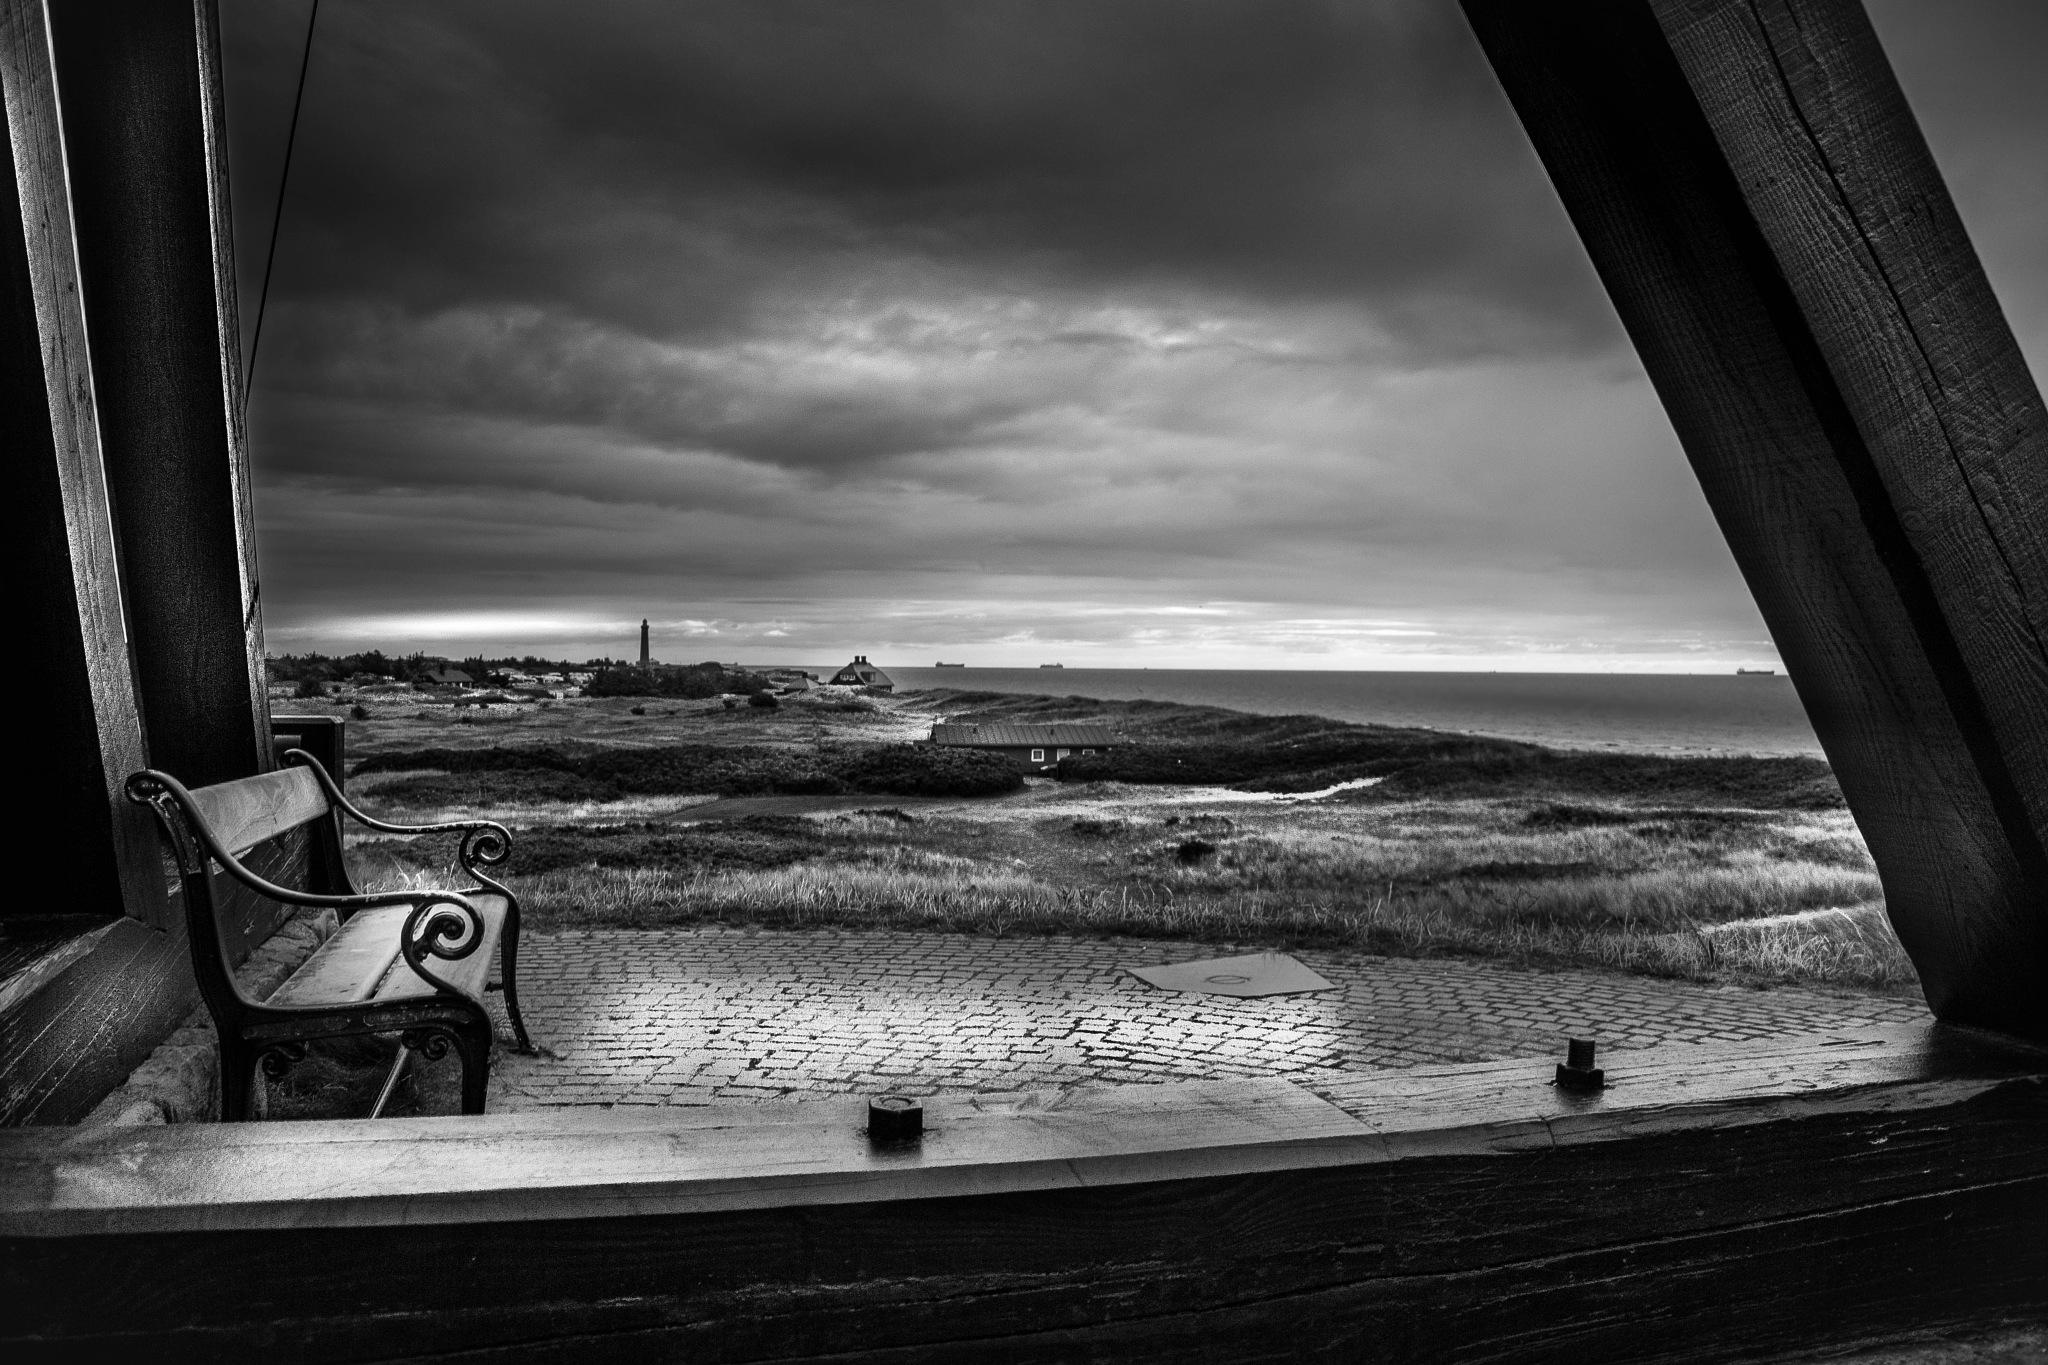 Skagen, Denmark by Kurt Land